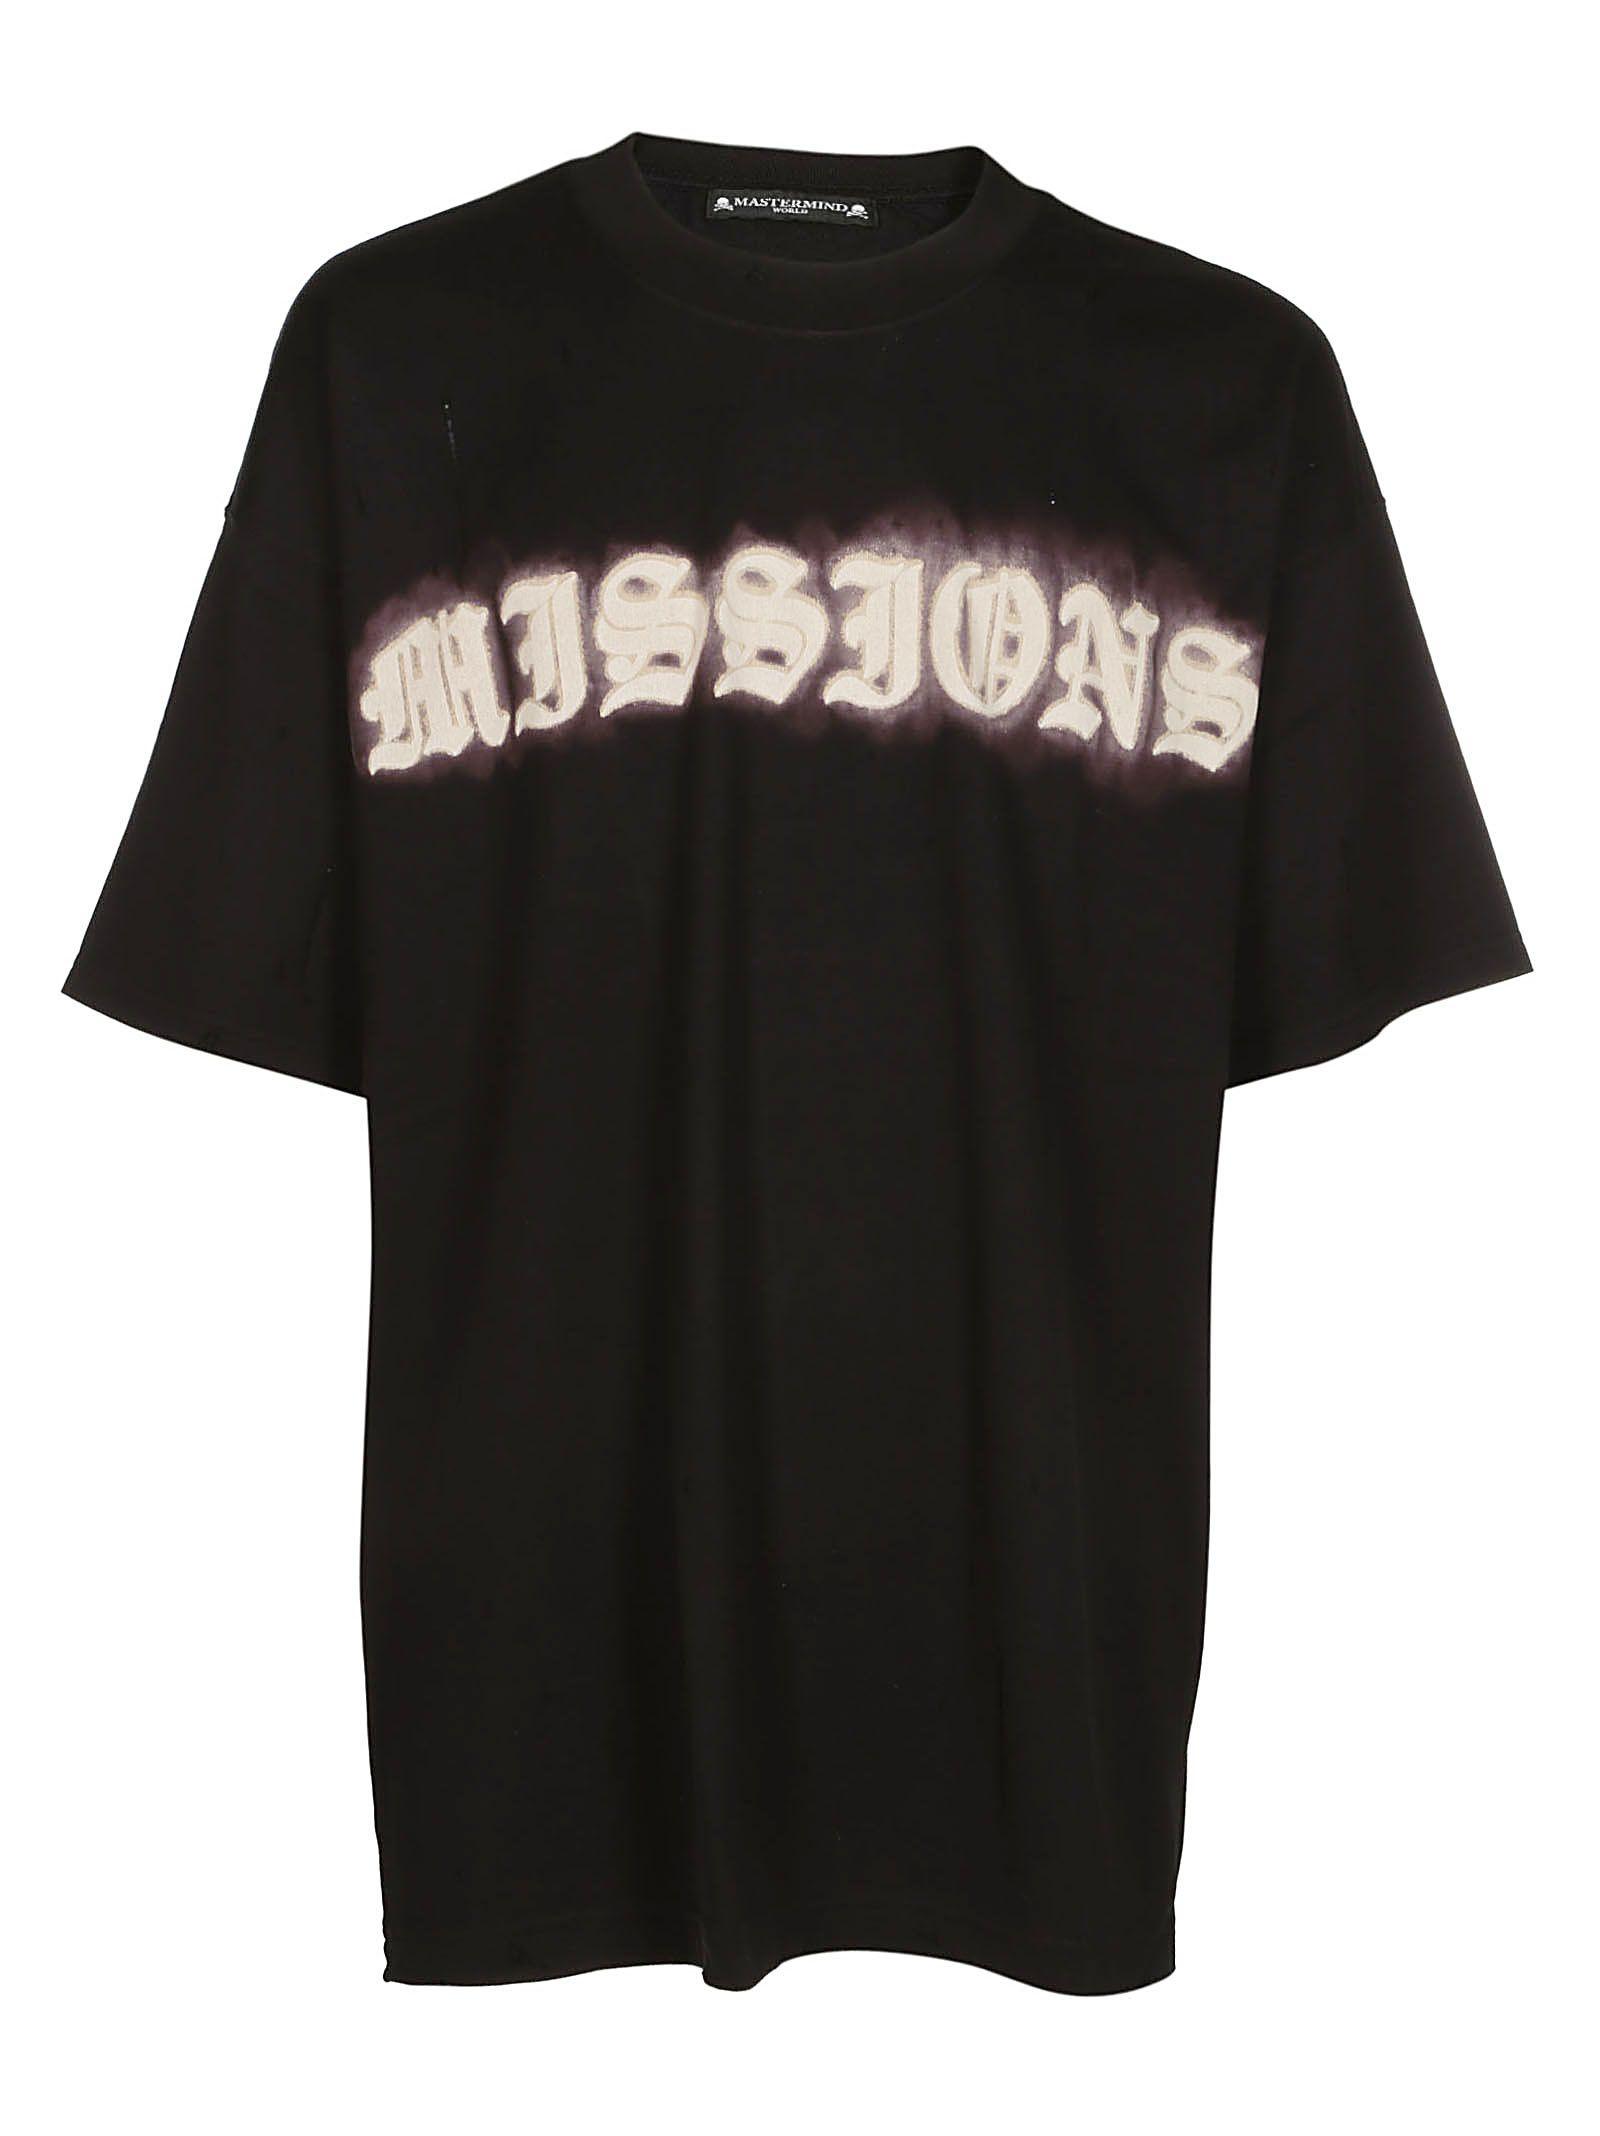 Mastermind Japan Missions Print T-shirt